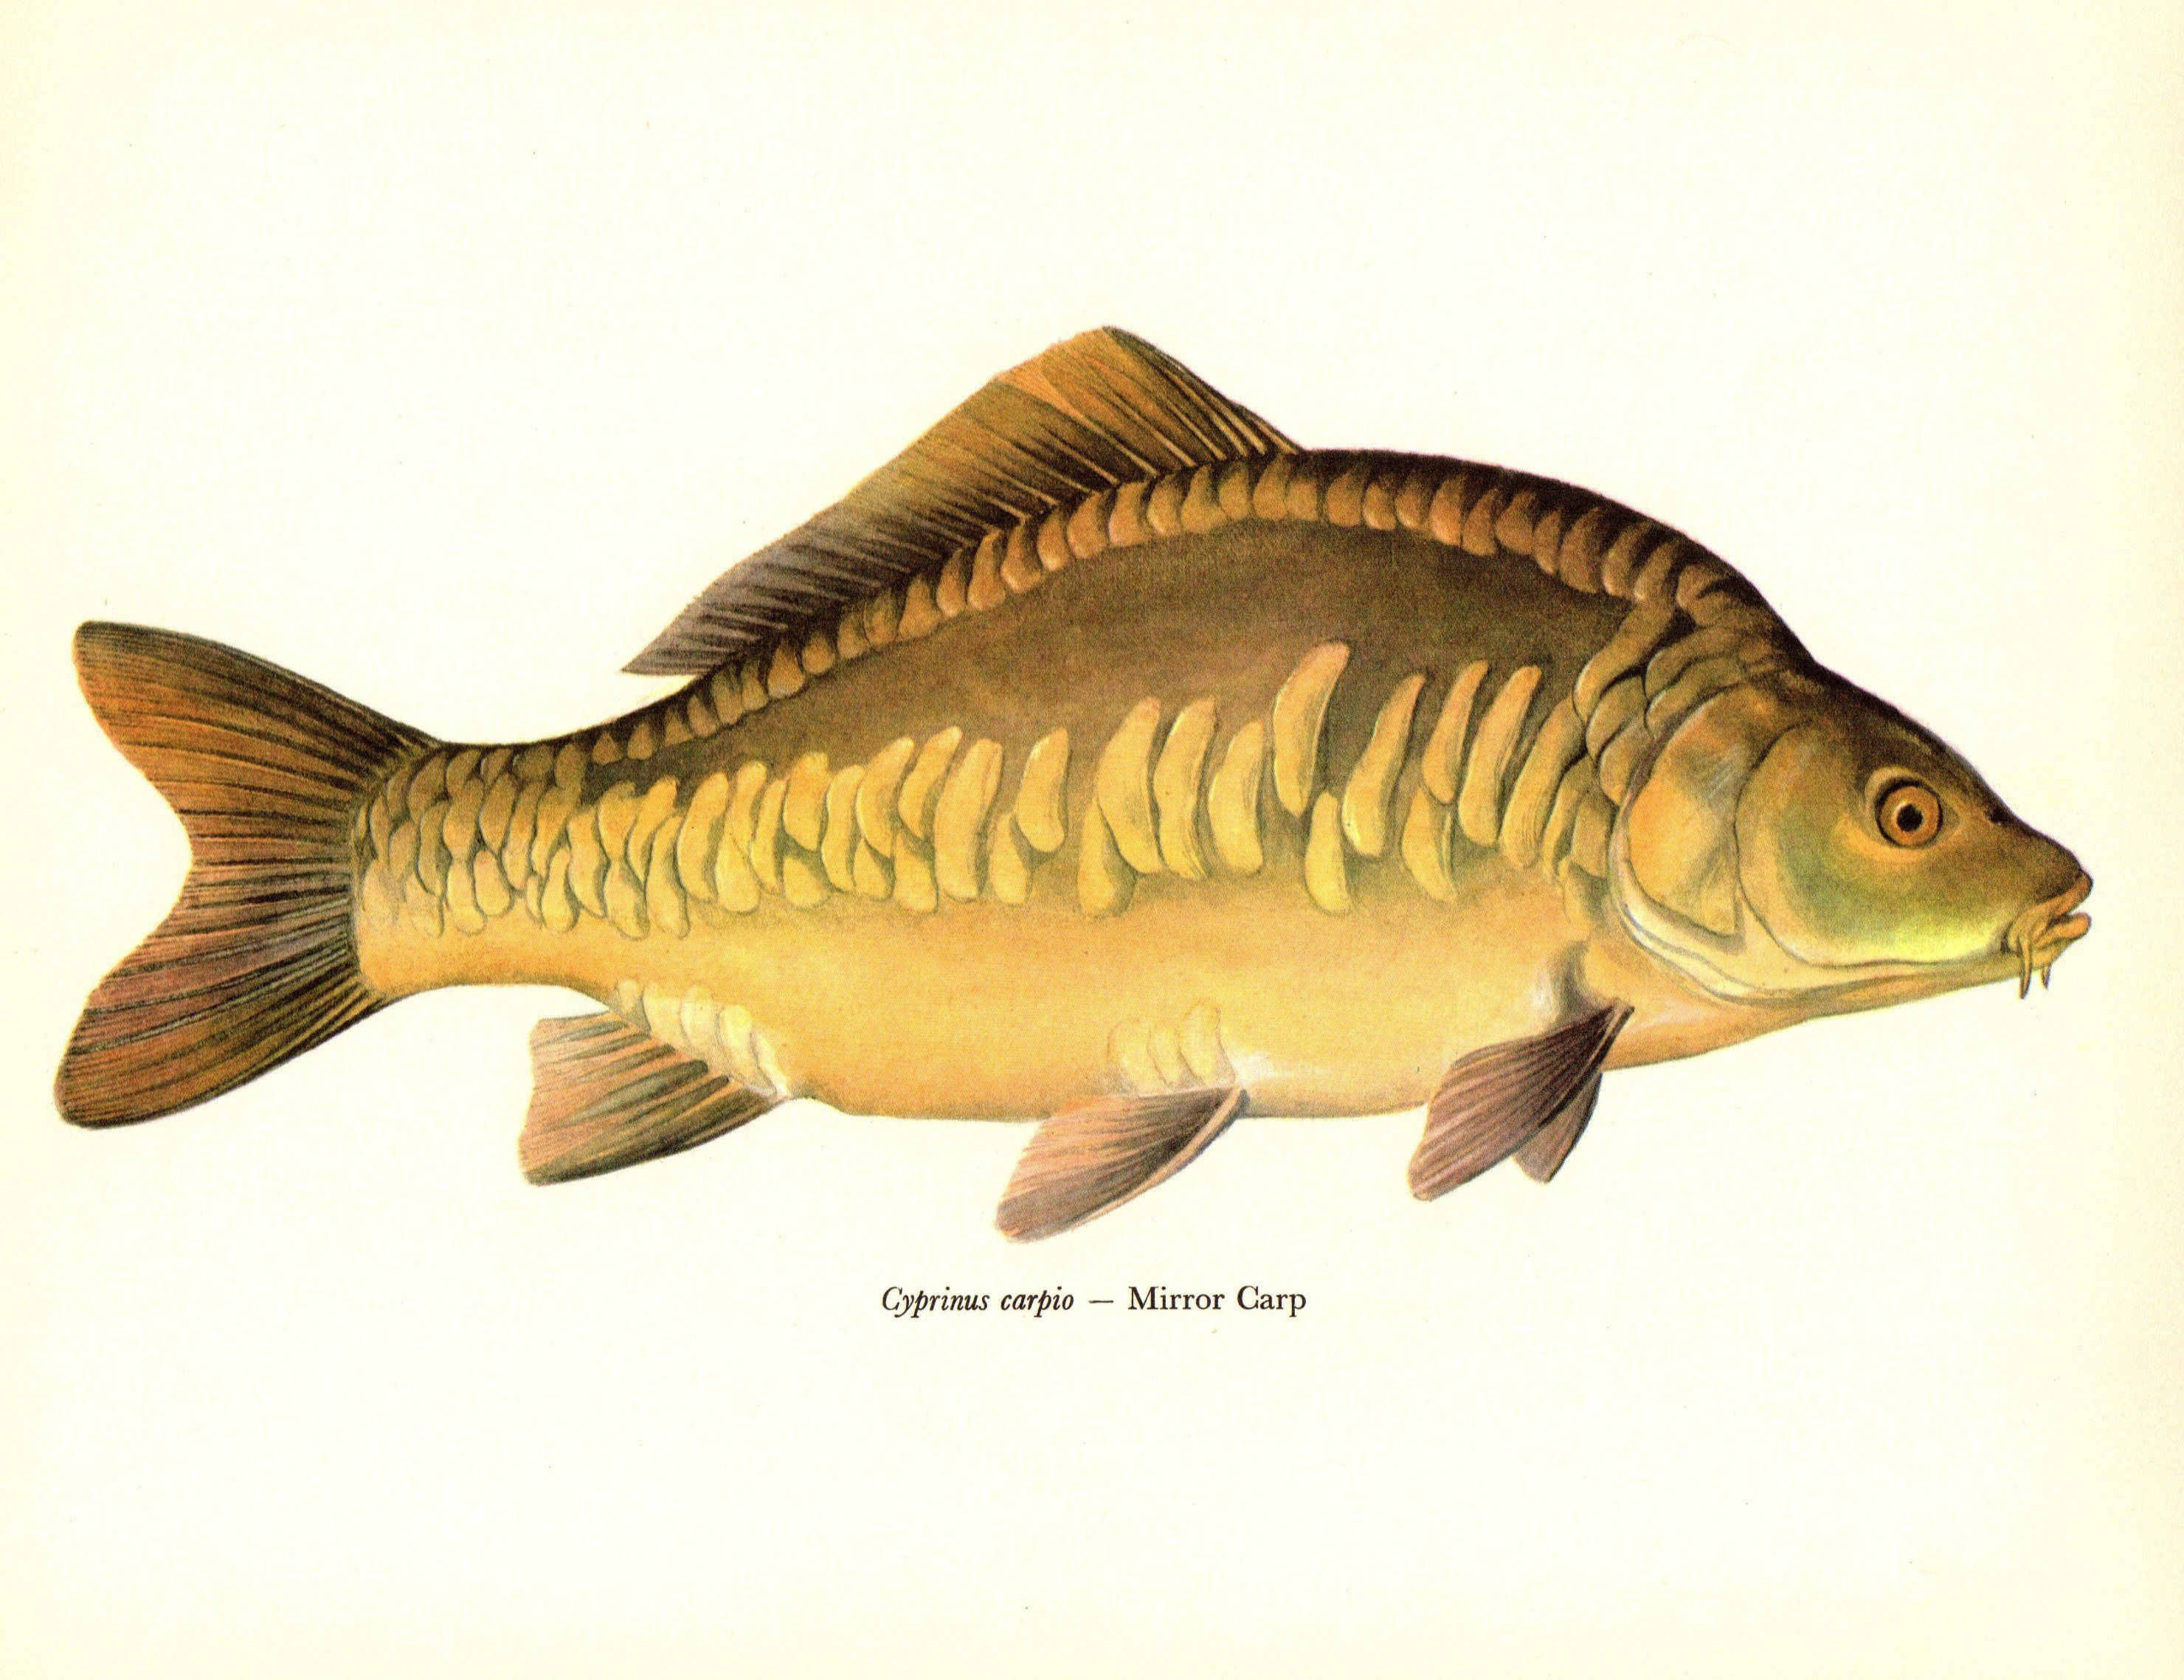 Antique Fish Prints Set of 4 Vintage Fish Art Gallery Wall Art ...